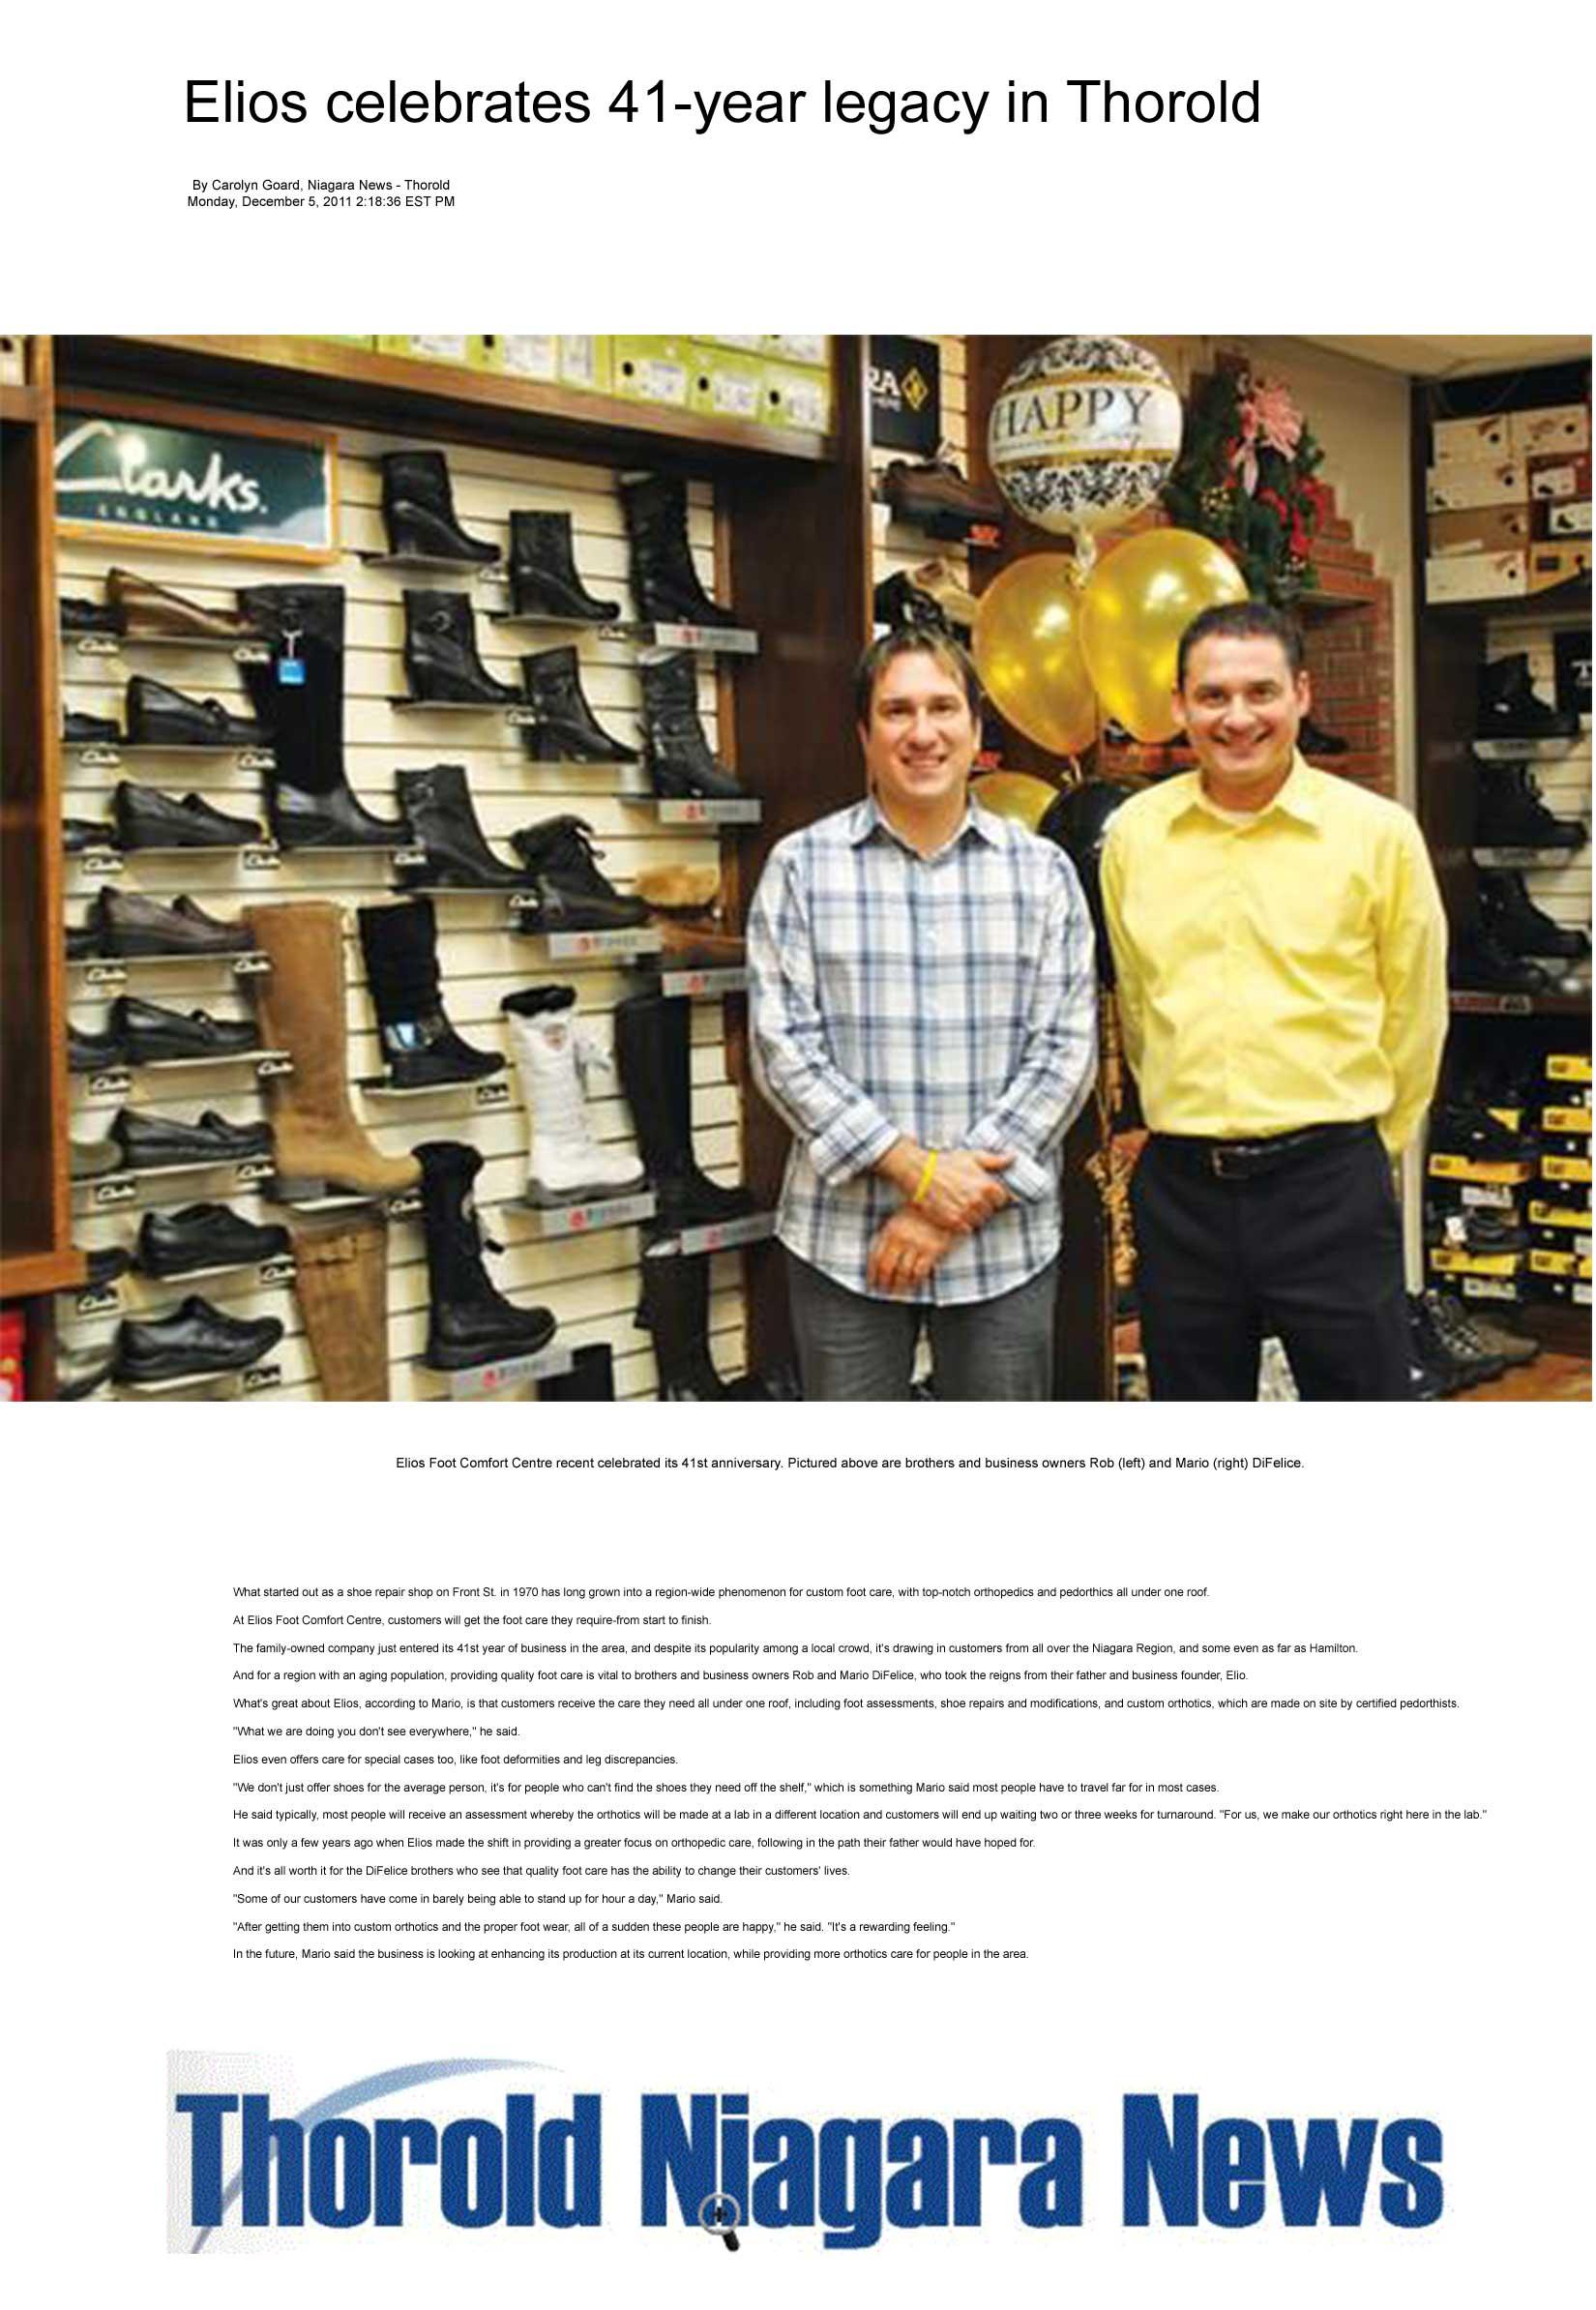 Elios-41-years-legacy-Thorold-_-Thorold-Niagara-News